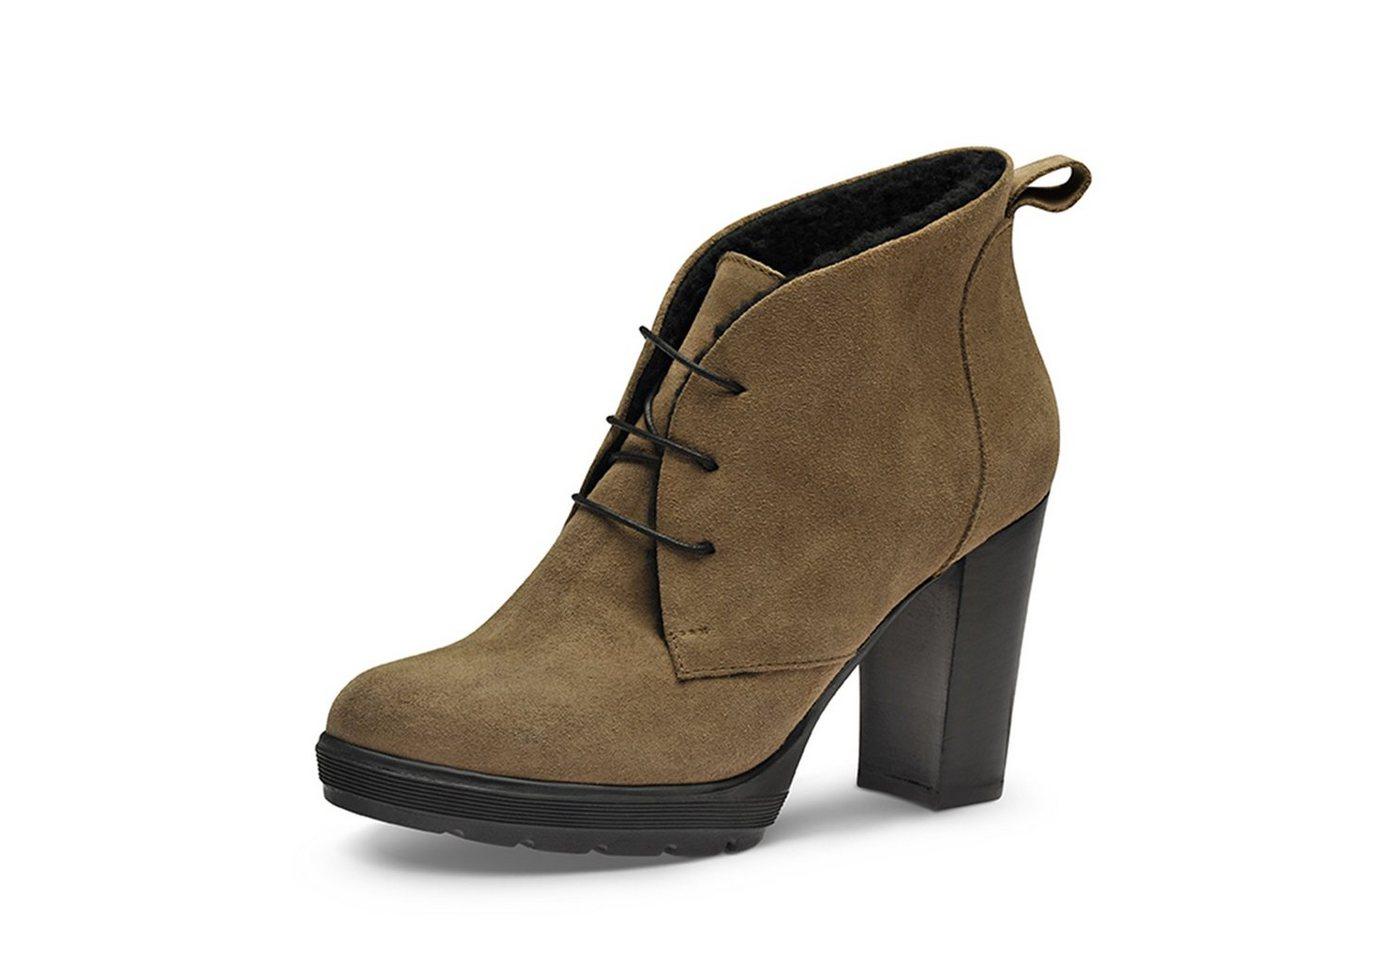 Evita »TUANA« Plateaustiefelette | Schuhe > Stiefeletten > Plateaustiefeletten | Evita